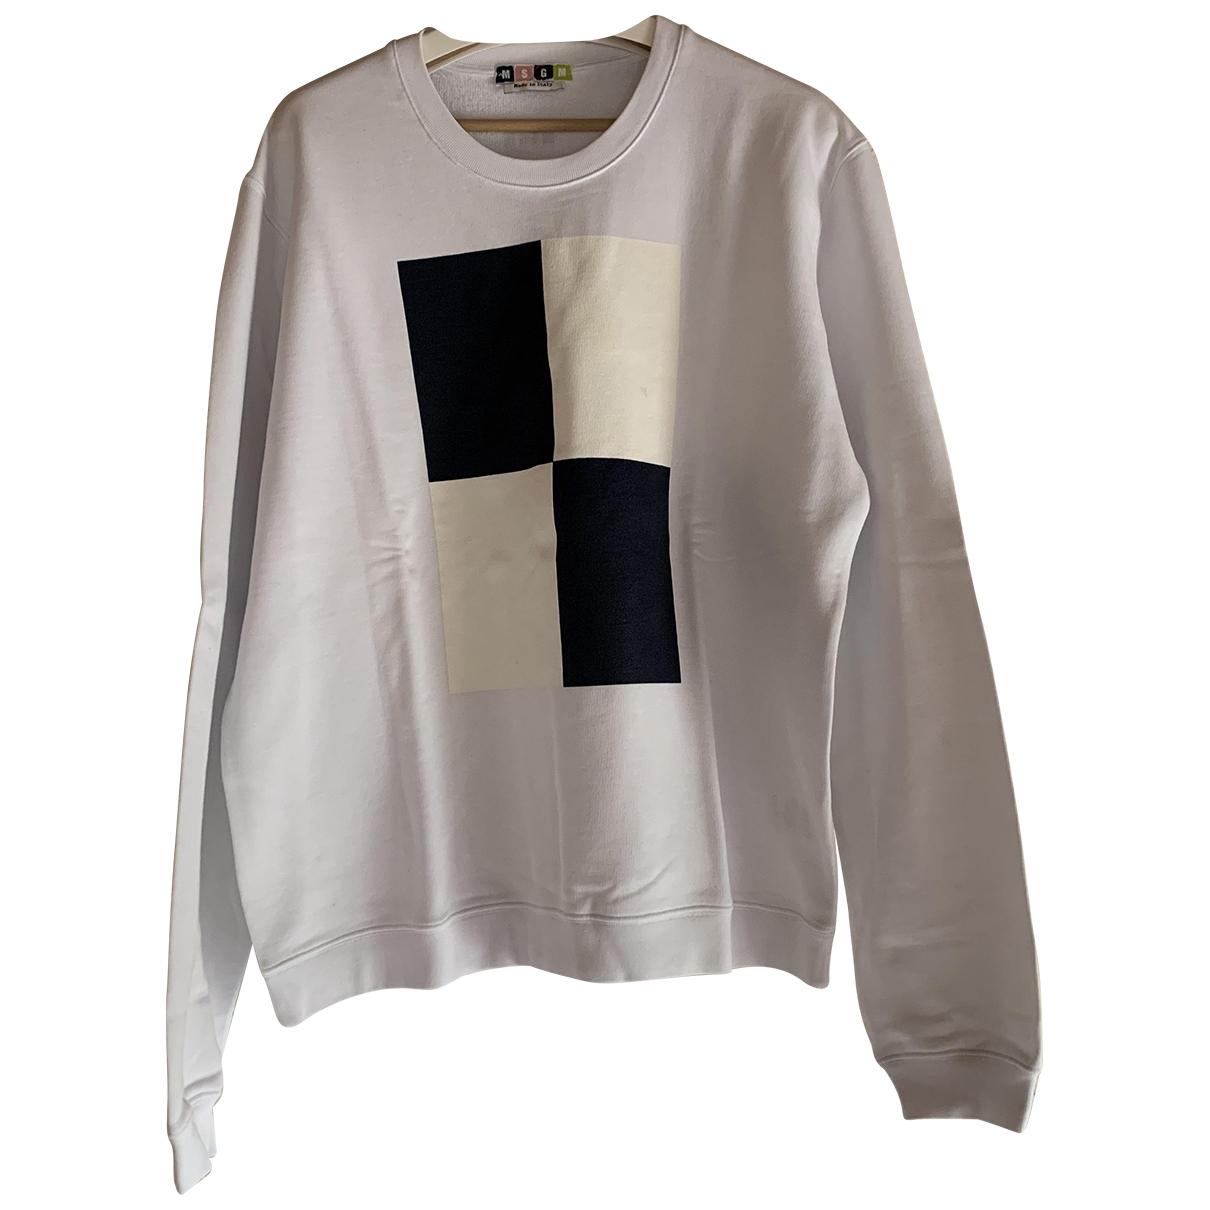 Msgm \N White Cotton Knitwear & Sweatshirts for Men XL International